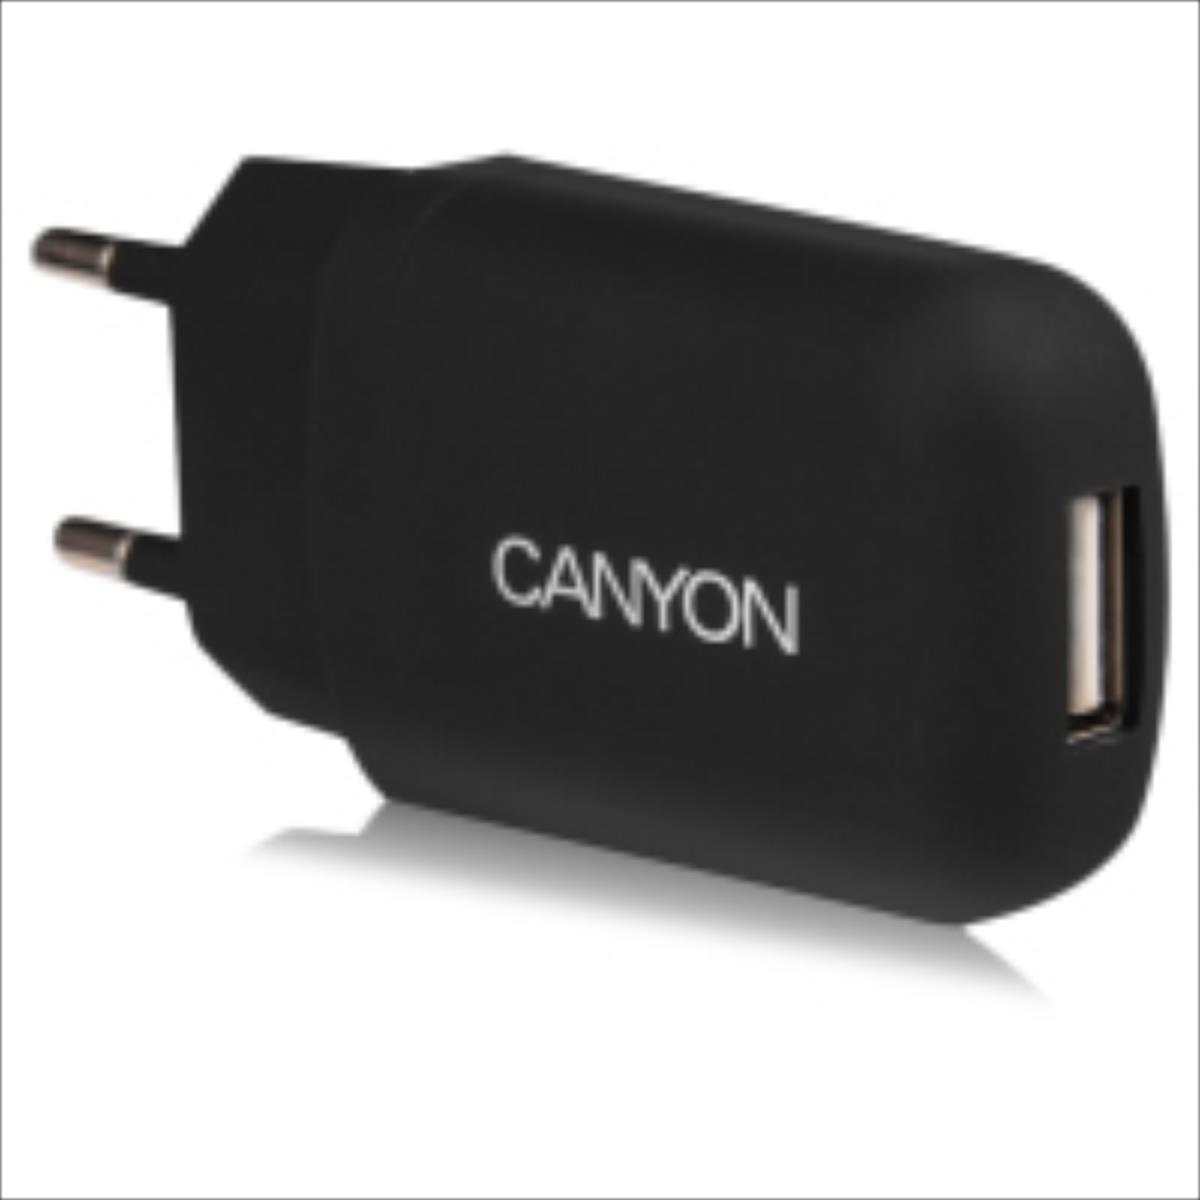 Canyon CNE-CHA11B 1A 5V USB Ligzdas Universāls Tīkla Lādētājs Melns (EU Blister) aksesuārs mobilajiem telefoniem